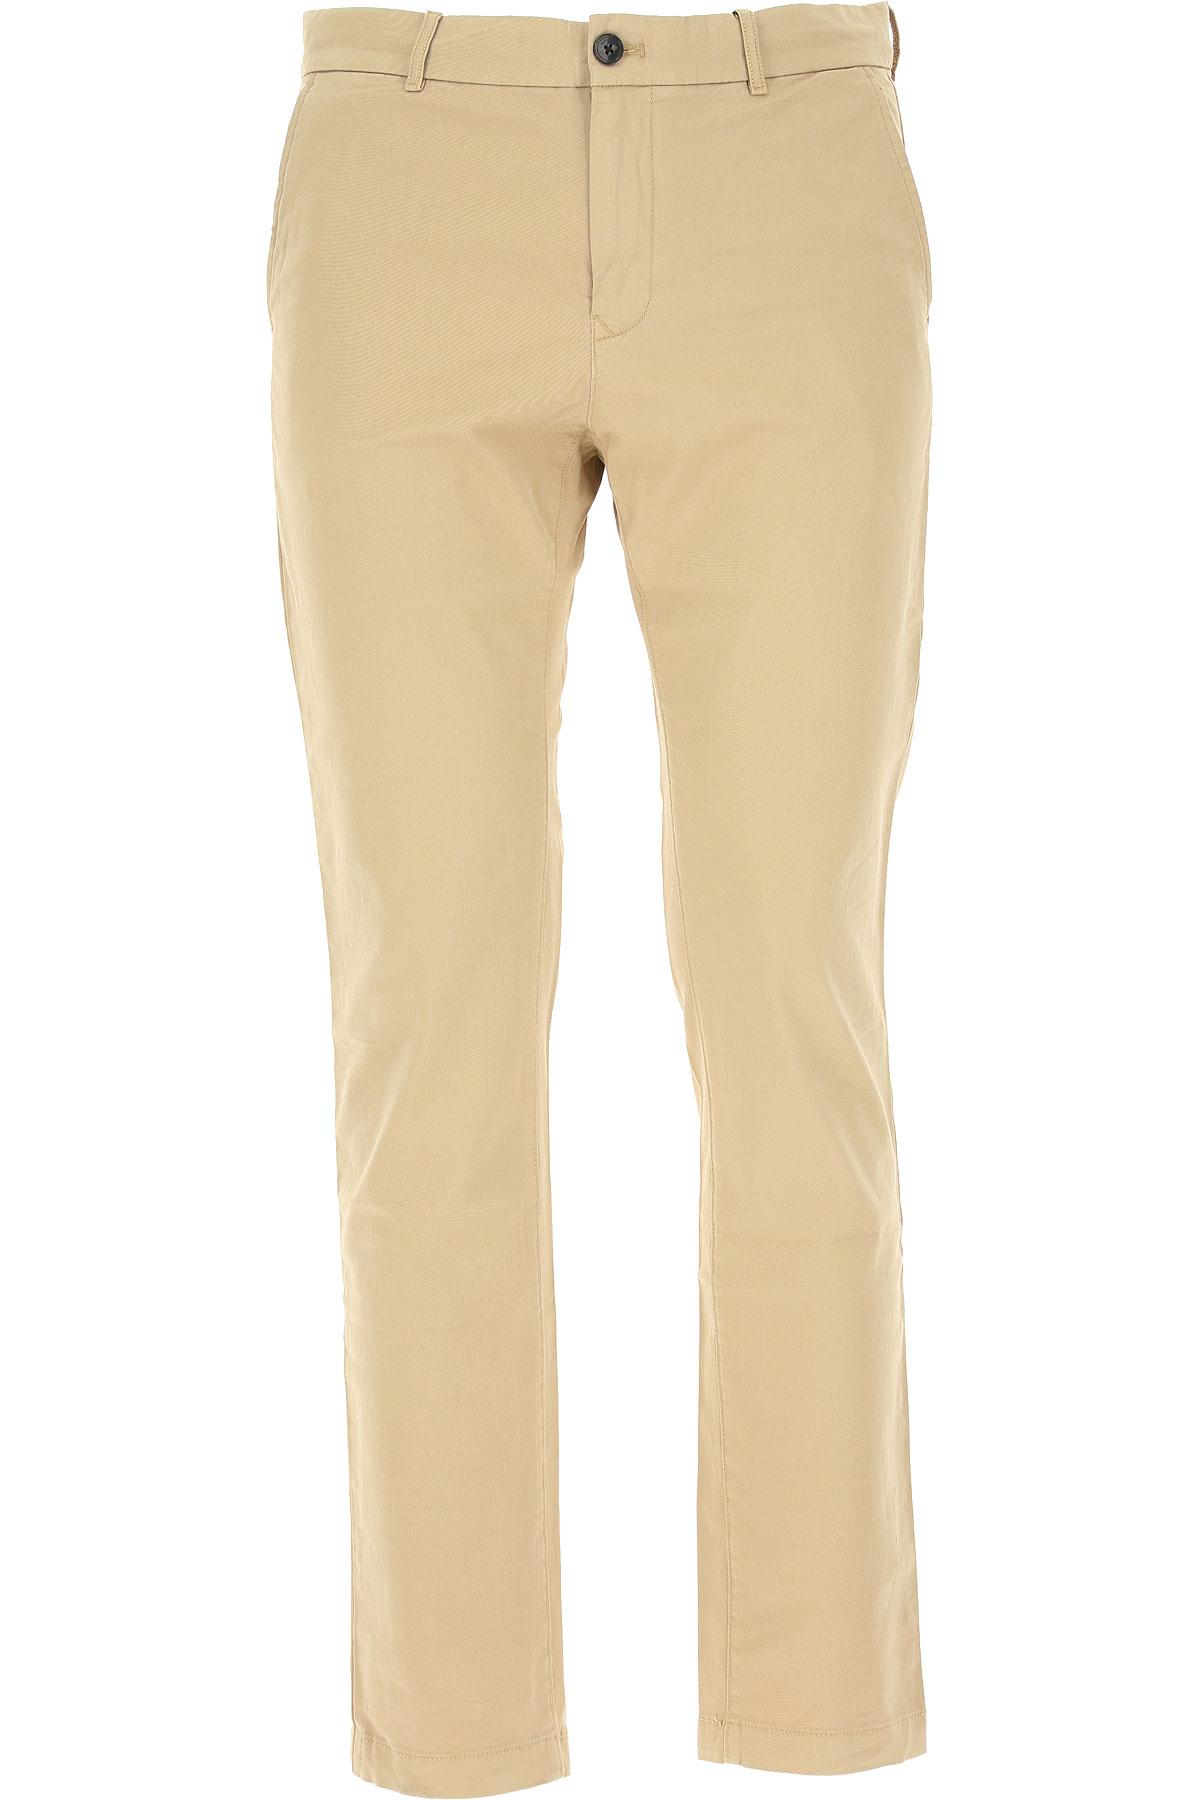 Calvin Klein Pants for Men On Sale in Outlet, Cornstalk, Cotton, 2019, 30 38